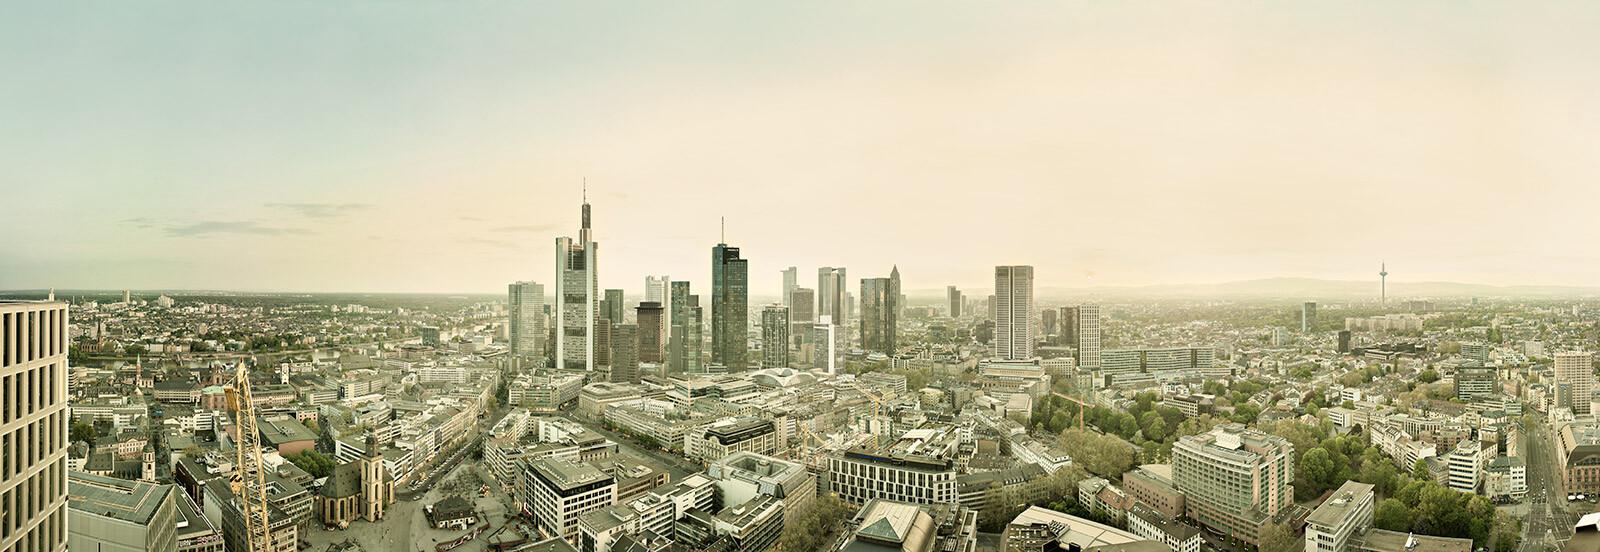 Frankfurt Skyline - Wolfgang Uhlig